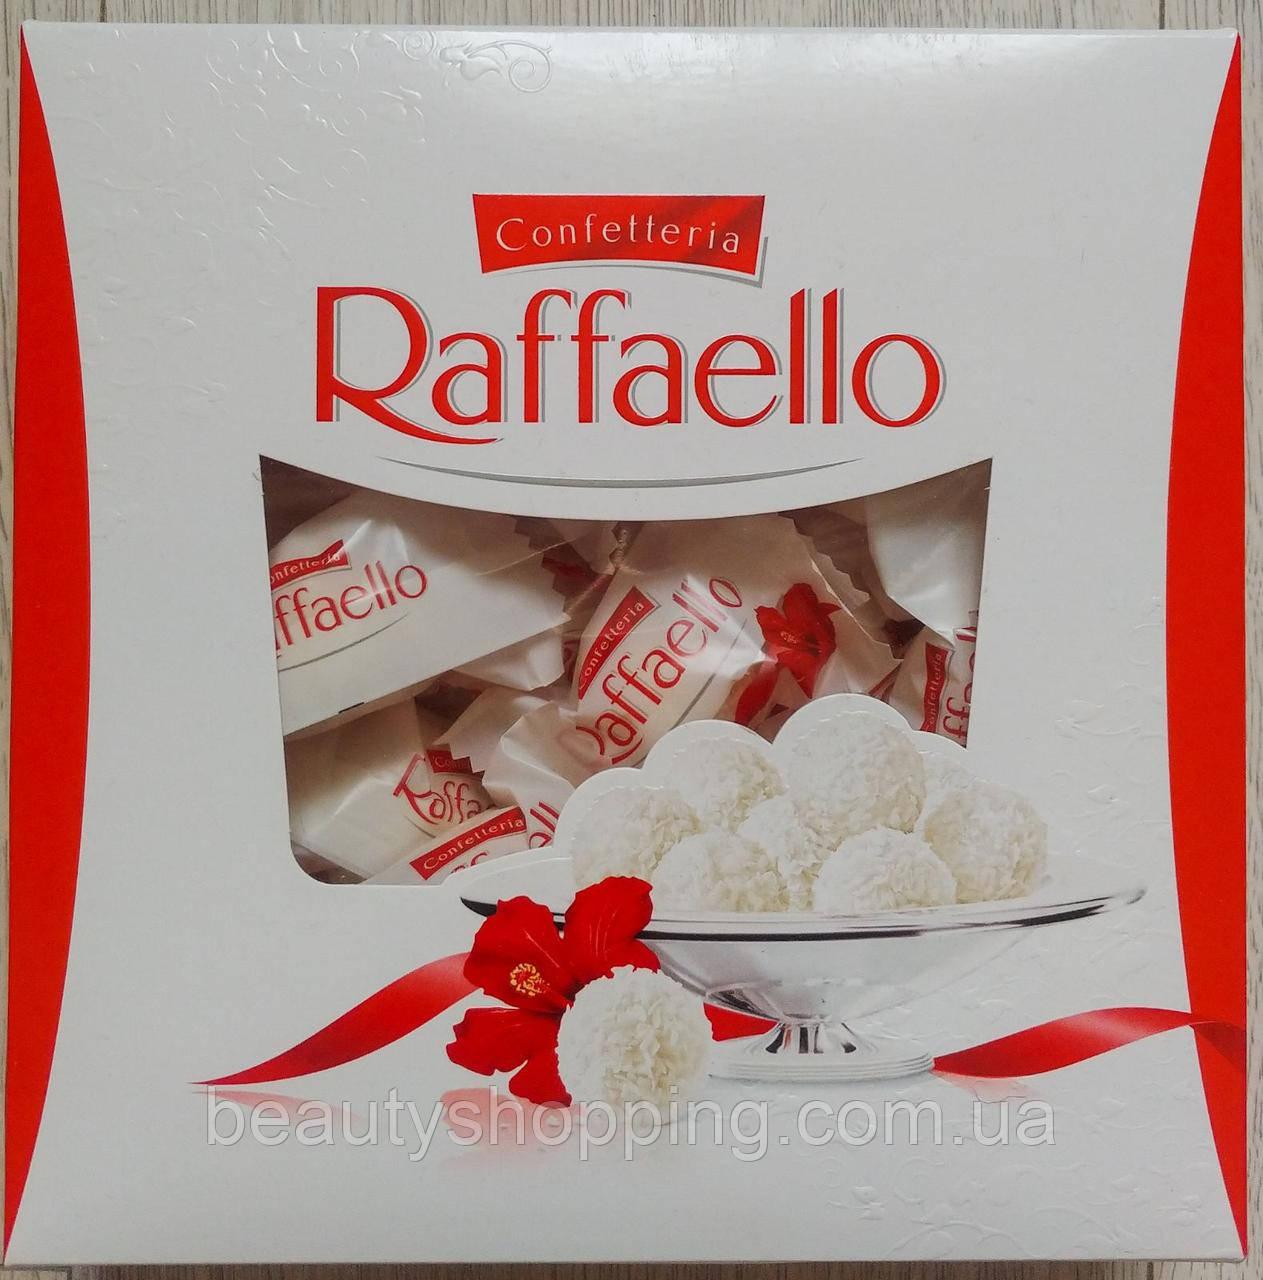 Raffaello Confetteria конфеты 240g Ferrero Польша